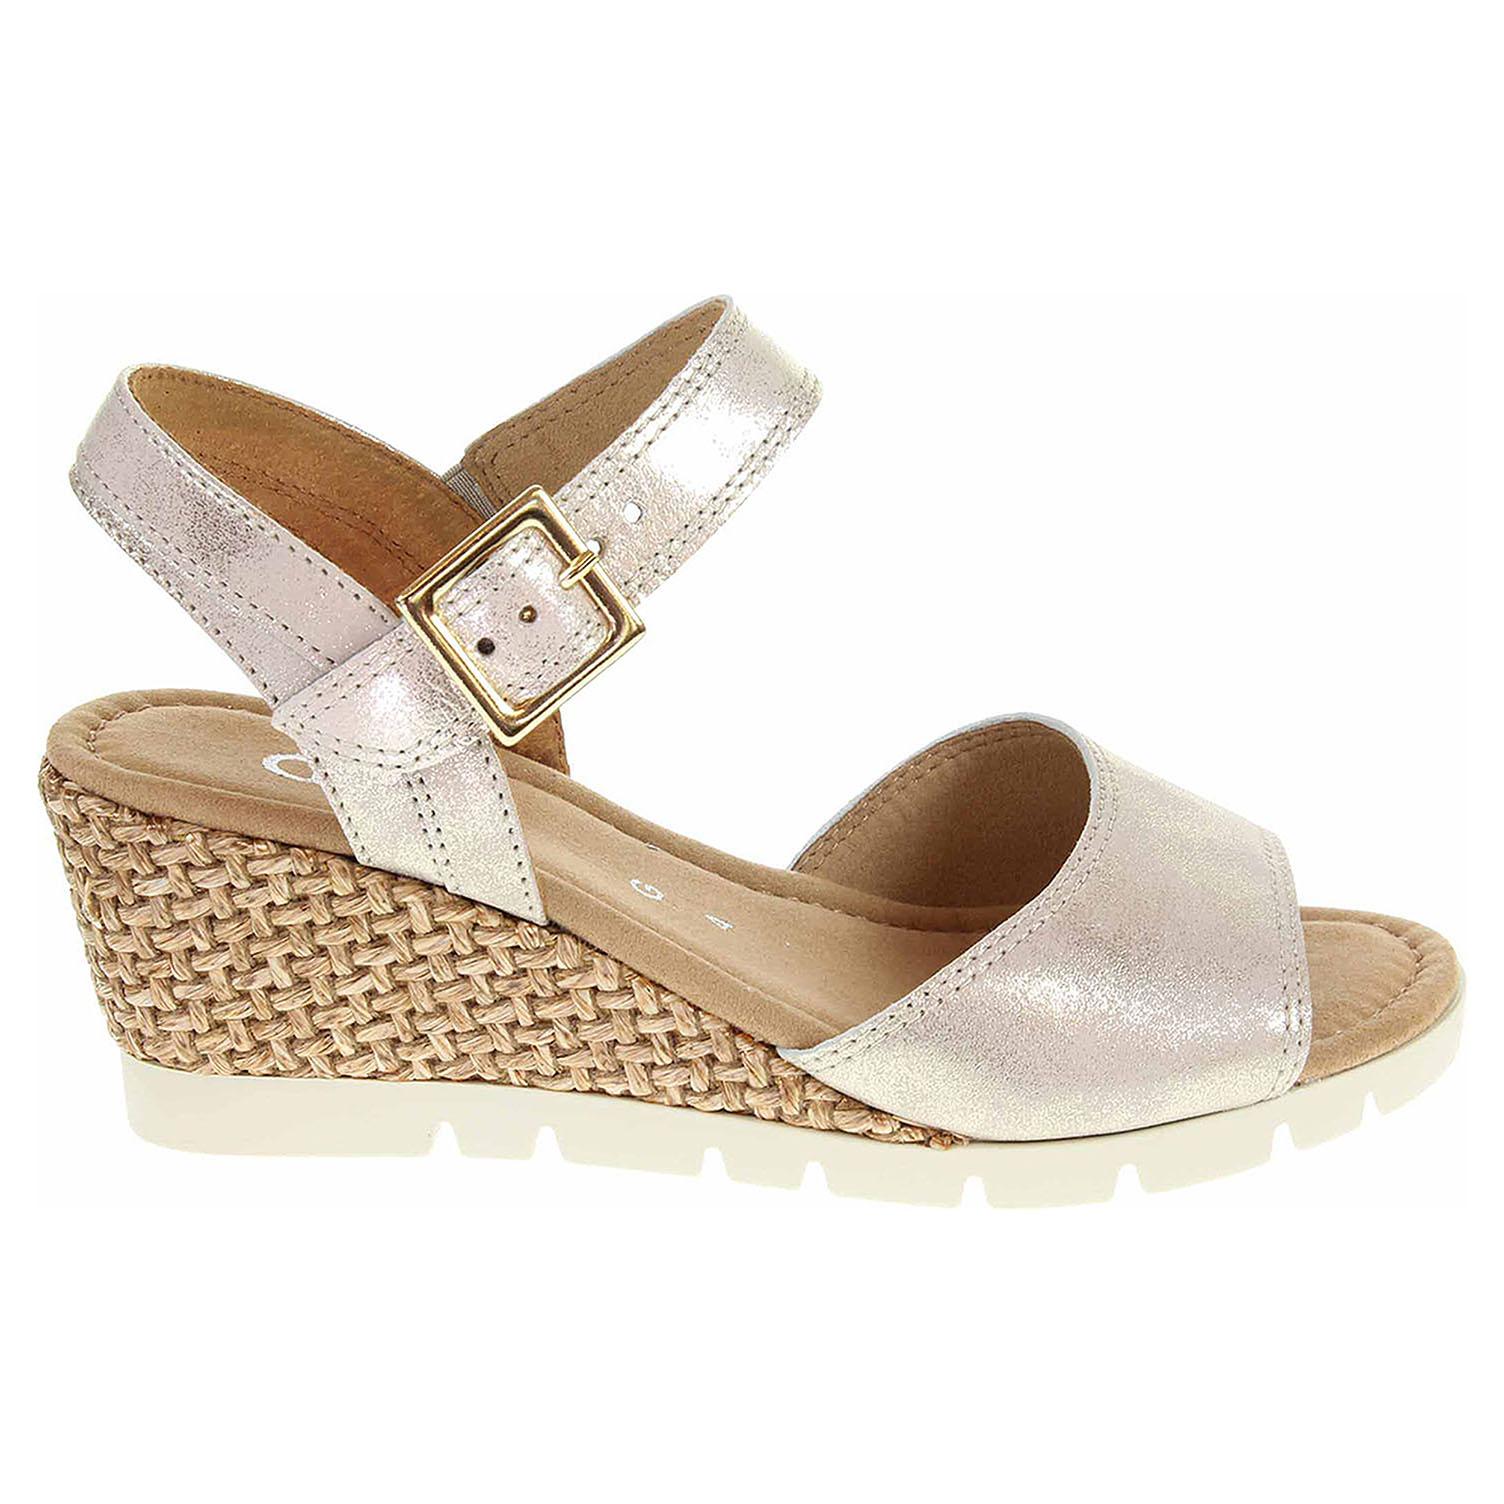 Ecco Gabor dámské sandály 82.842.63 platino 23801318